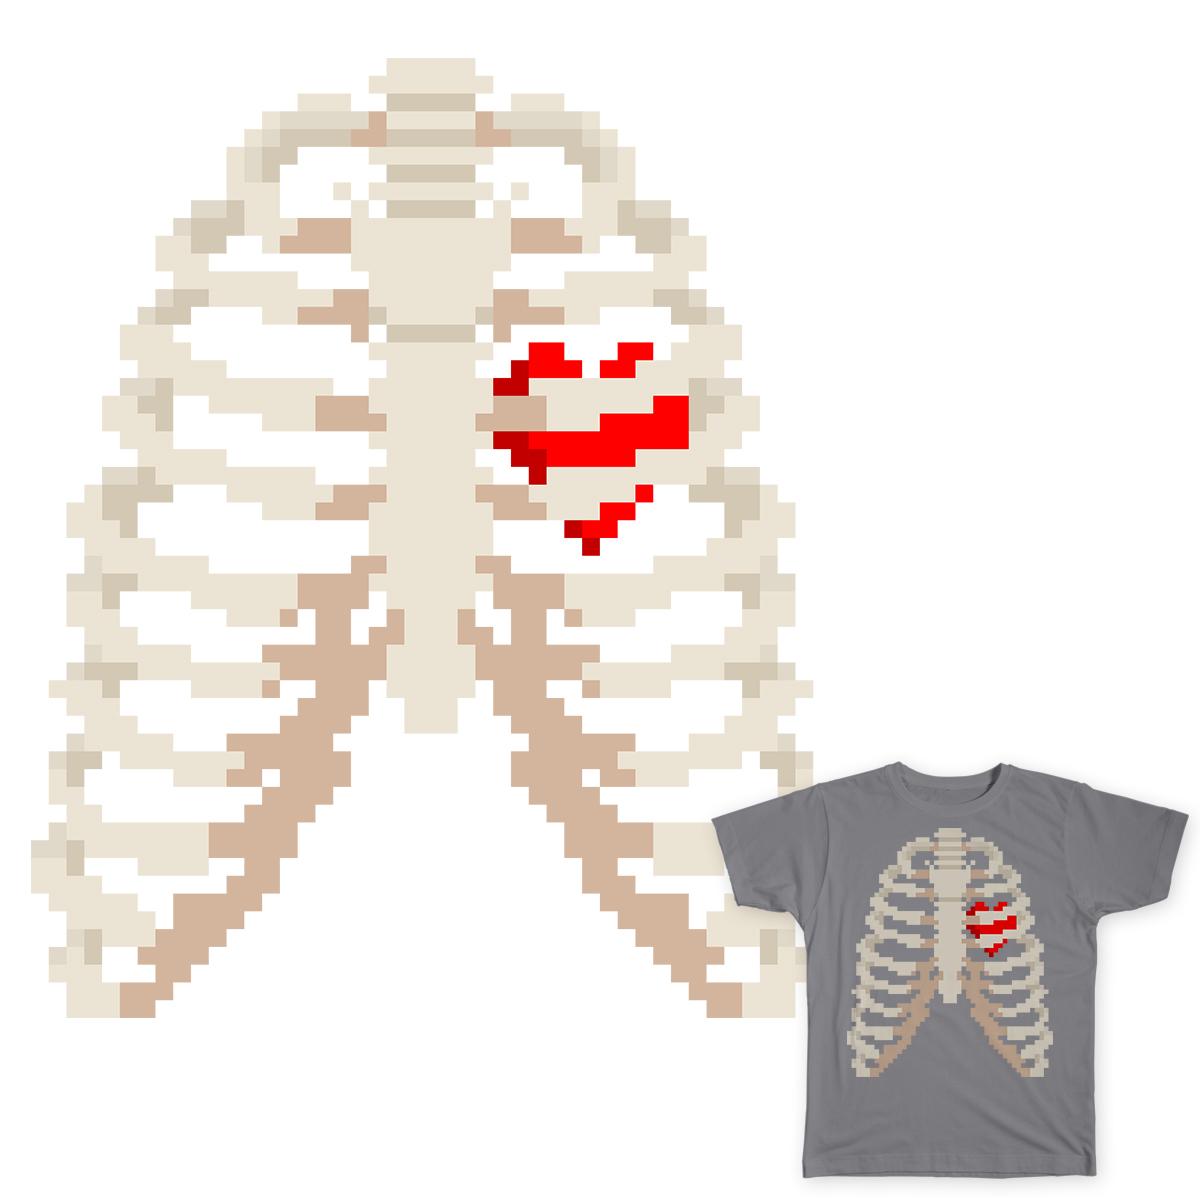 My Caged Heart by LaaraC on Threadless